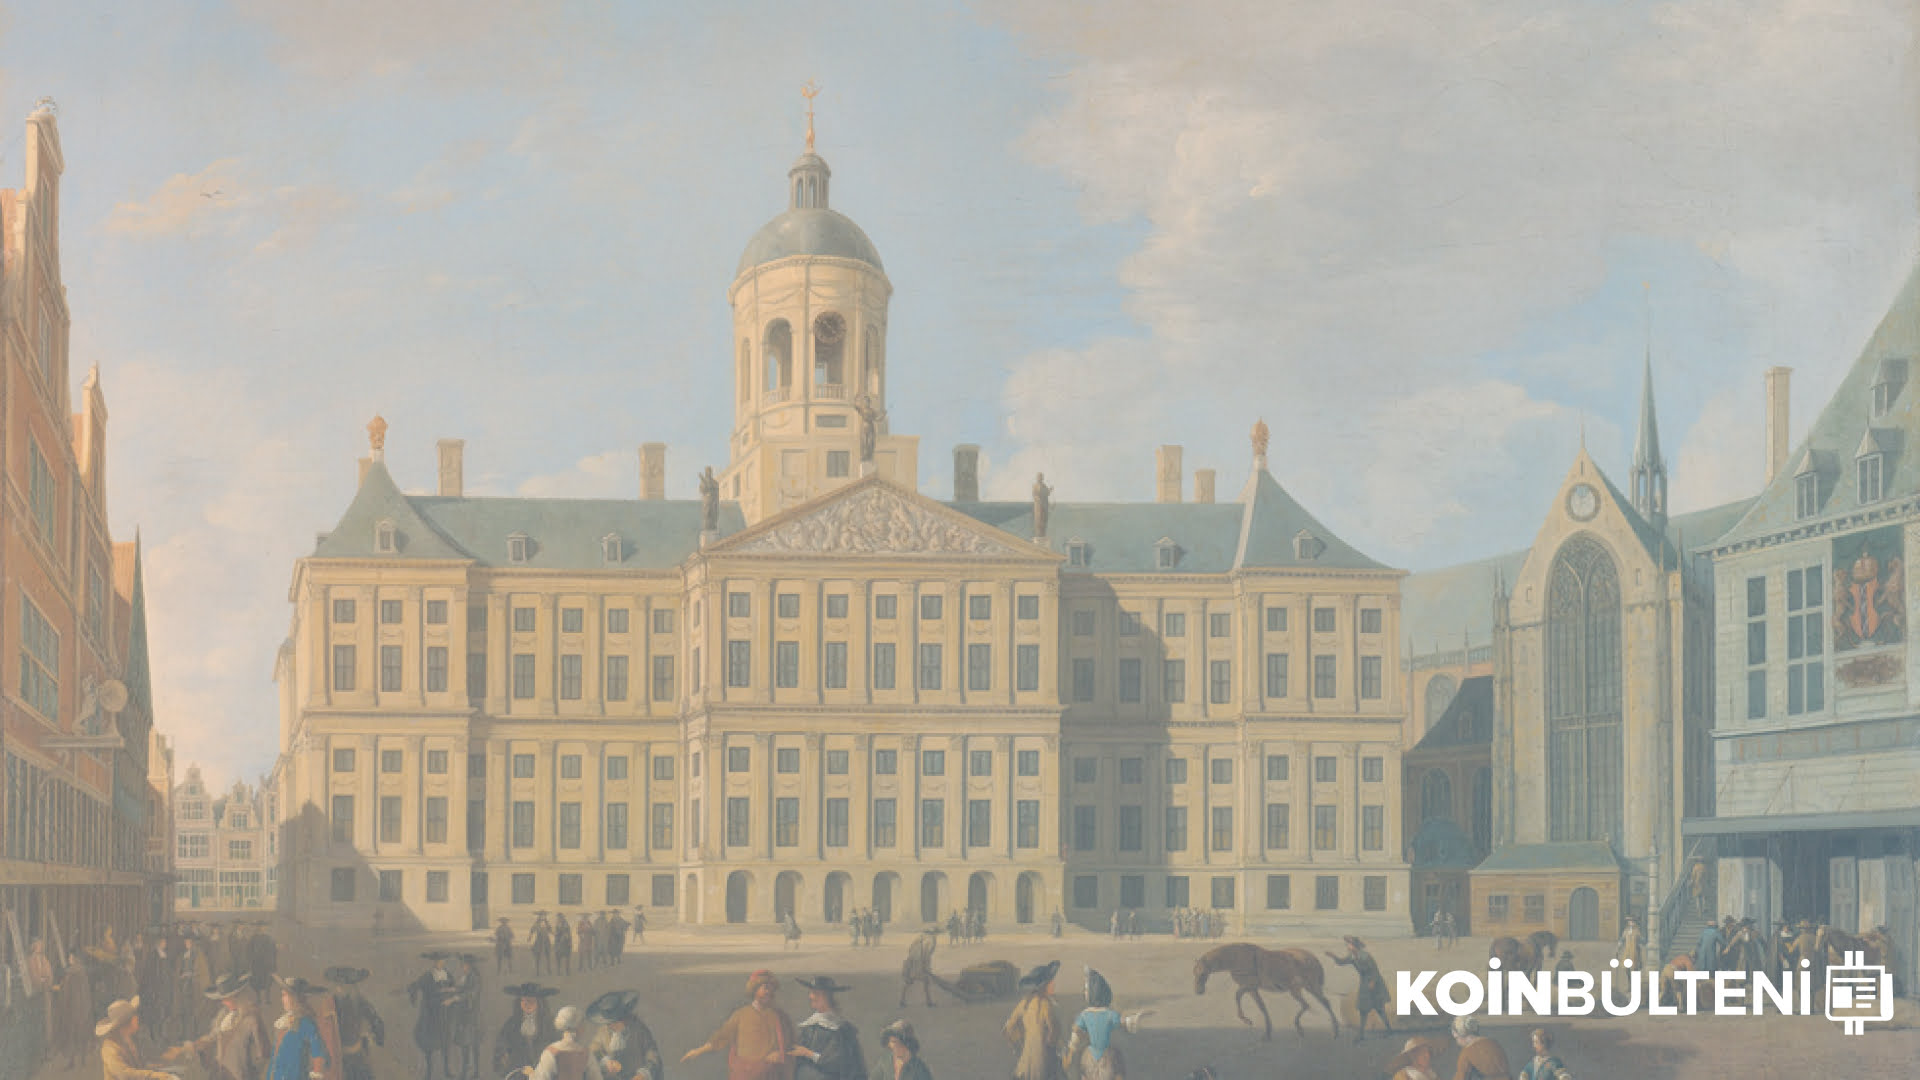 amsterdam bankası